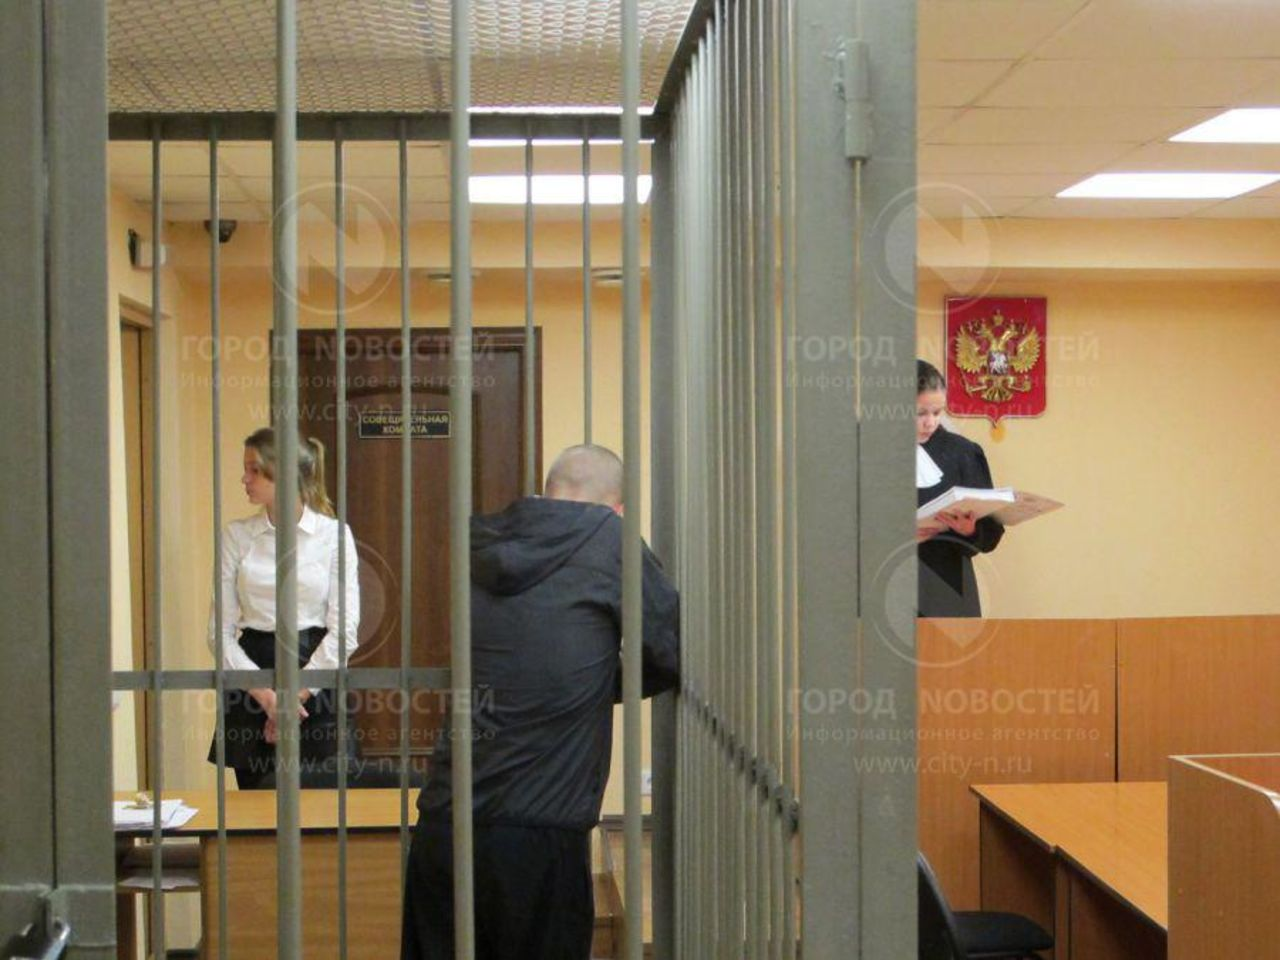 Новокузнечанина осудили заубийство матери иугон автомобиля